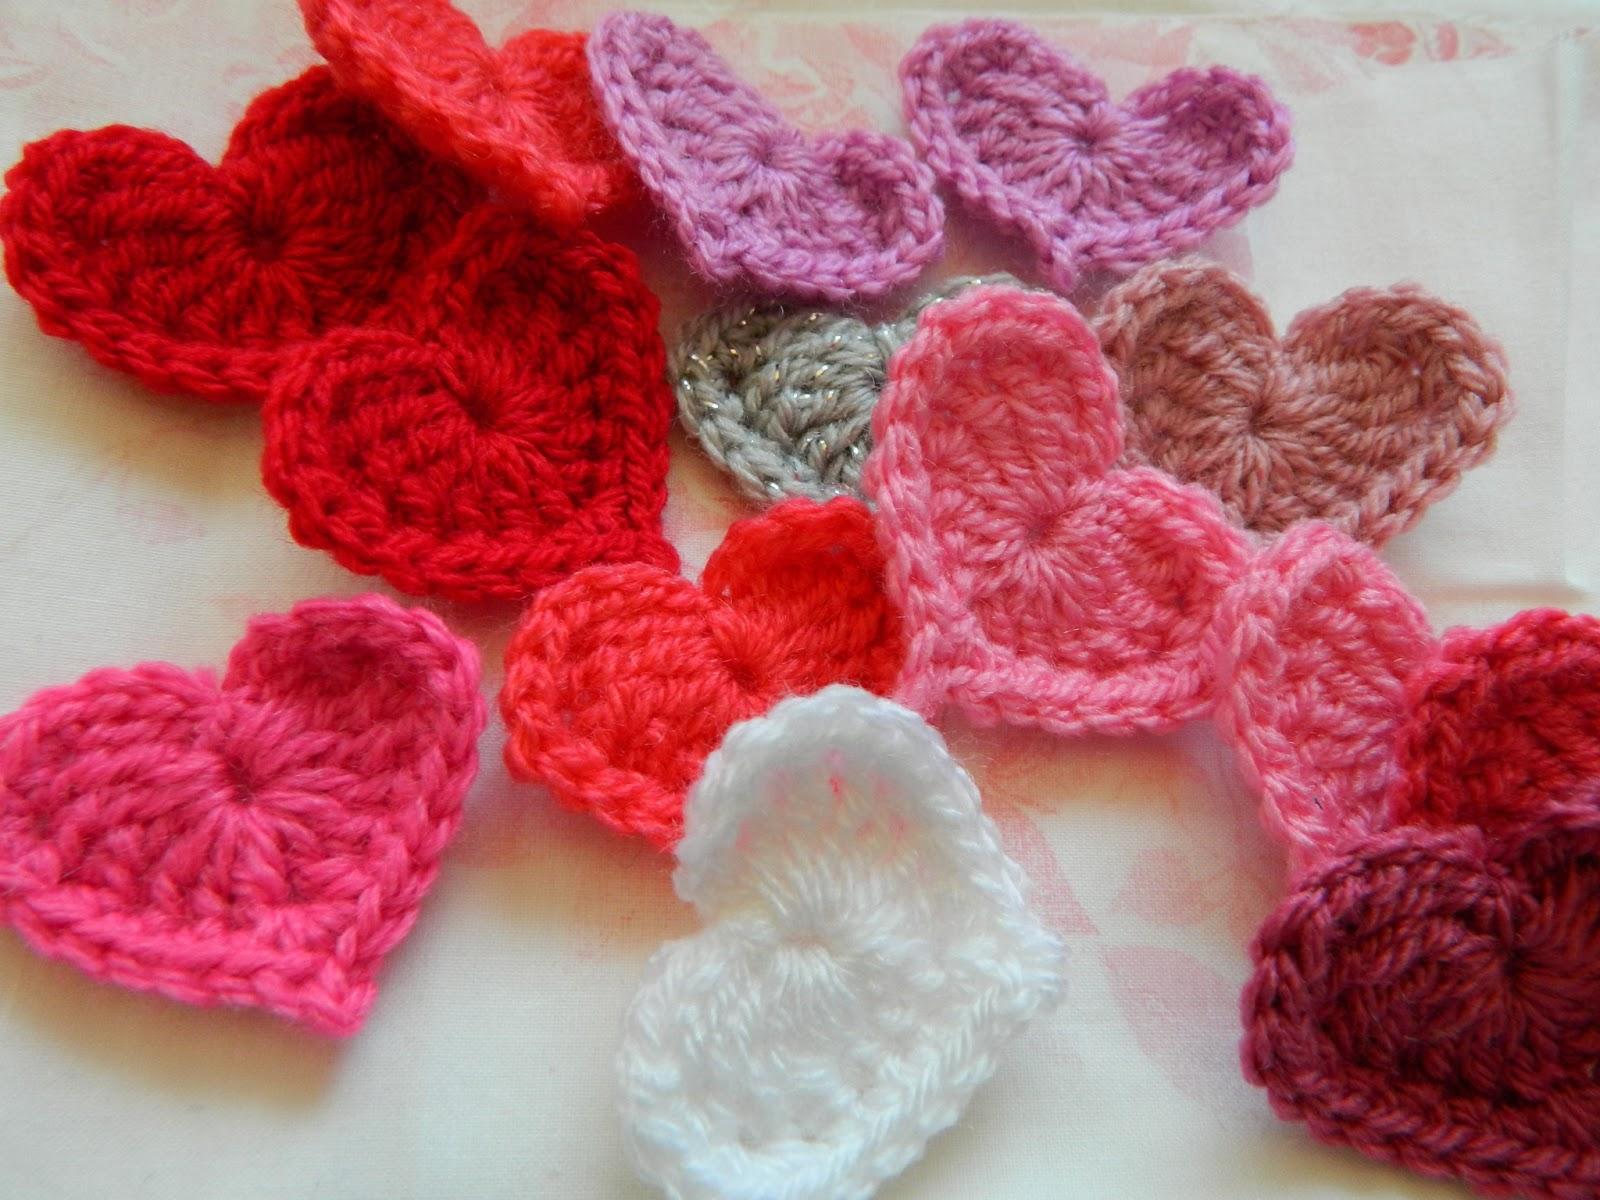 Crochet Patterns For Hearts : pinkfluffywarrior: Crochet heart (pattern)